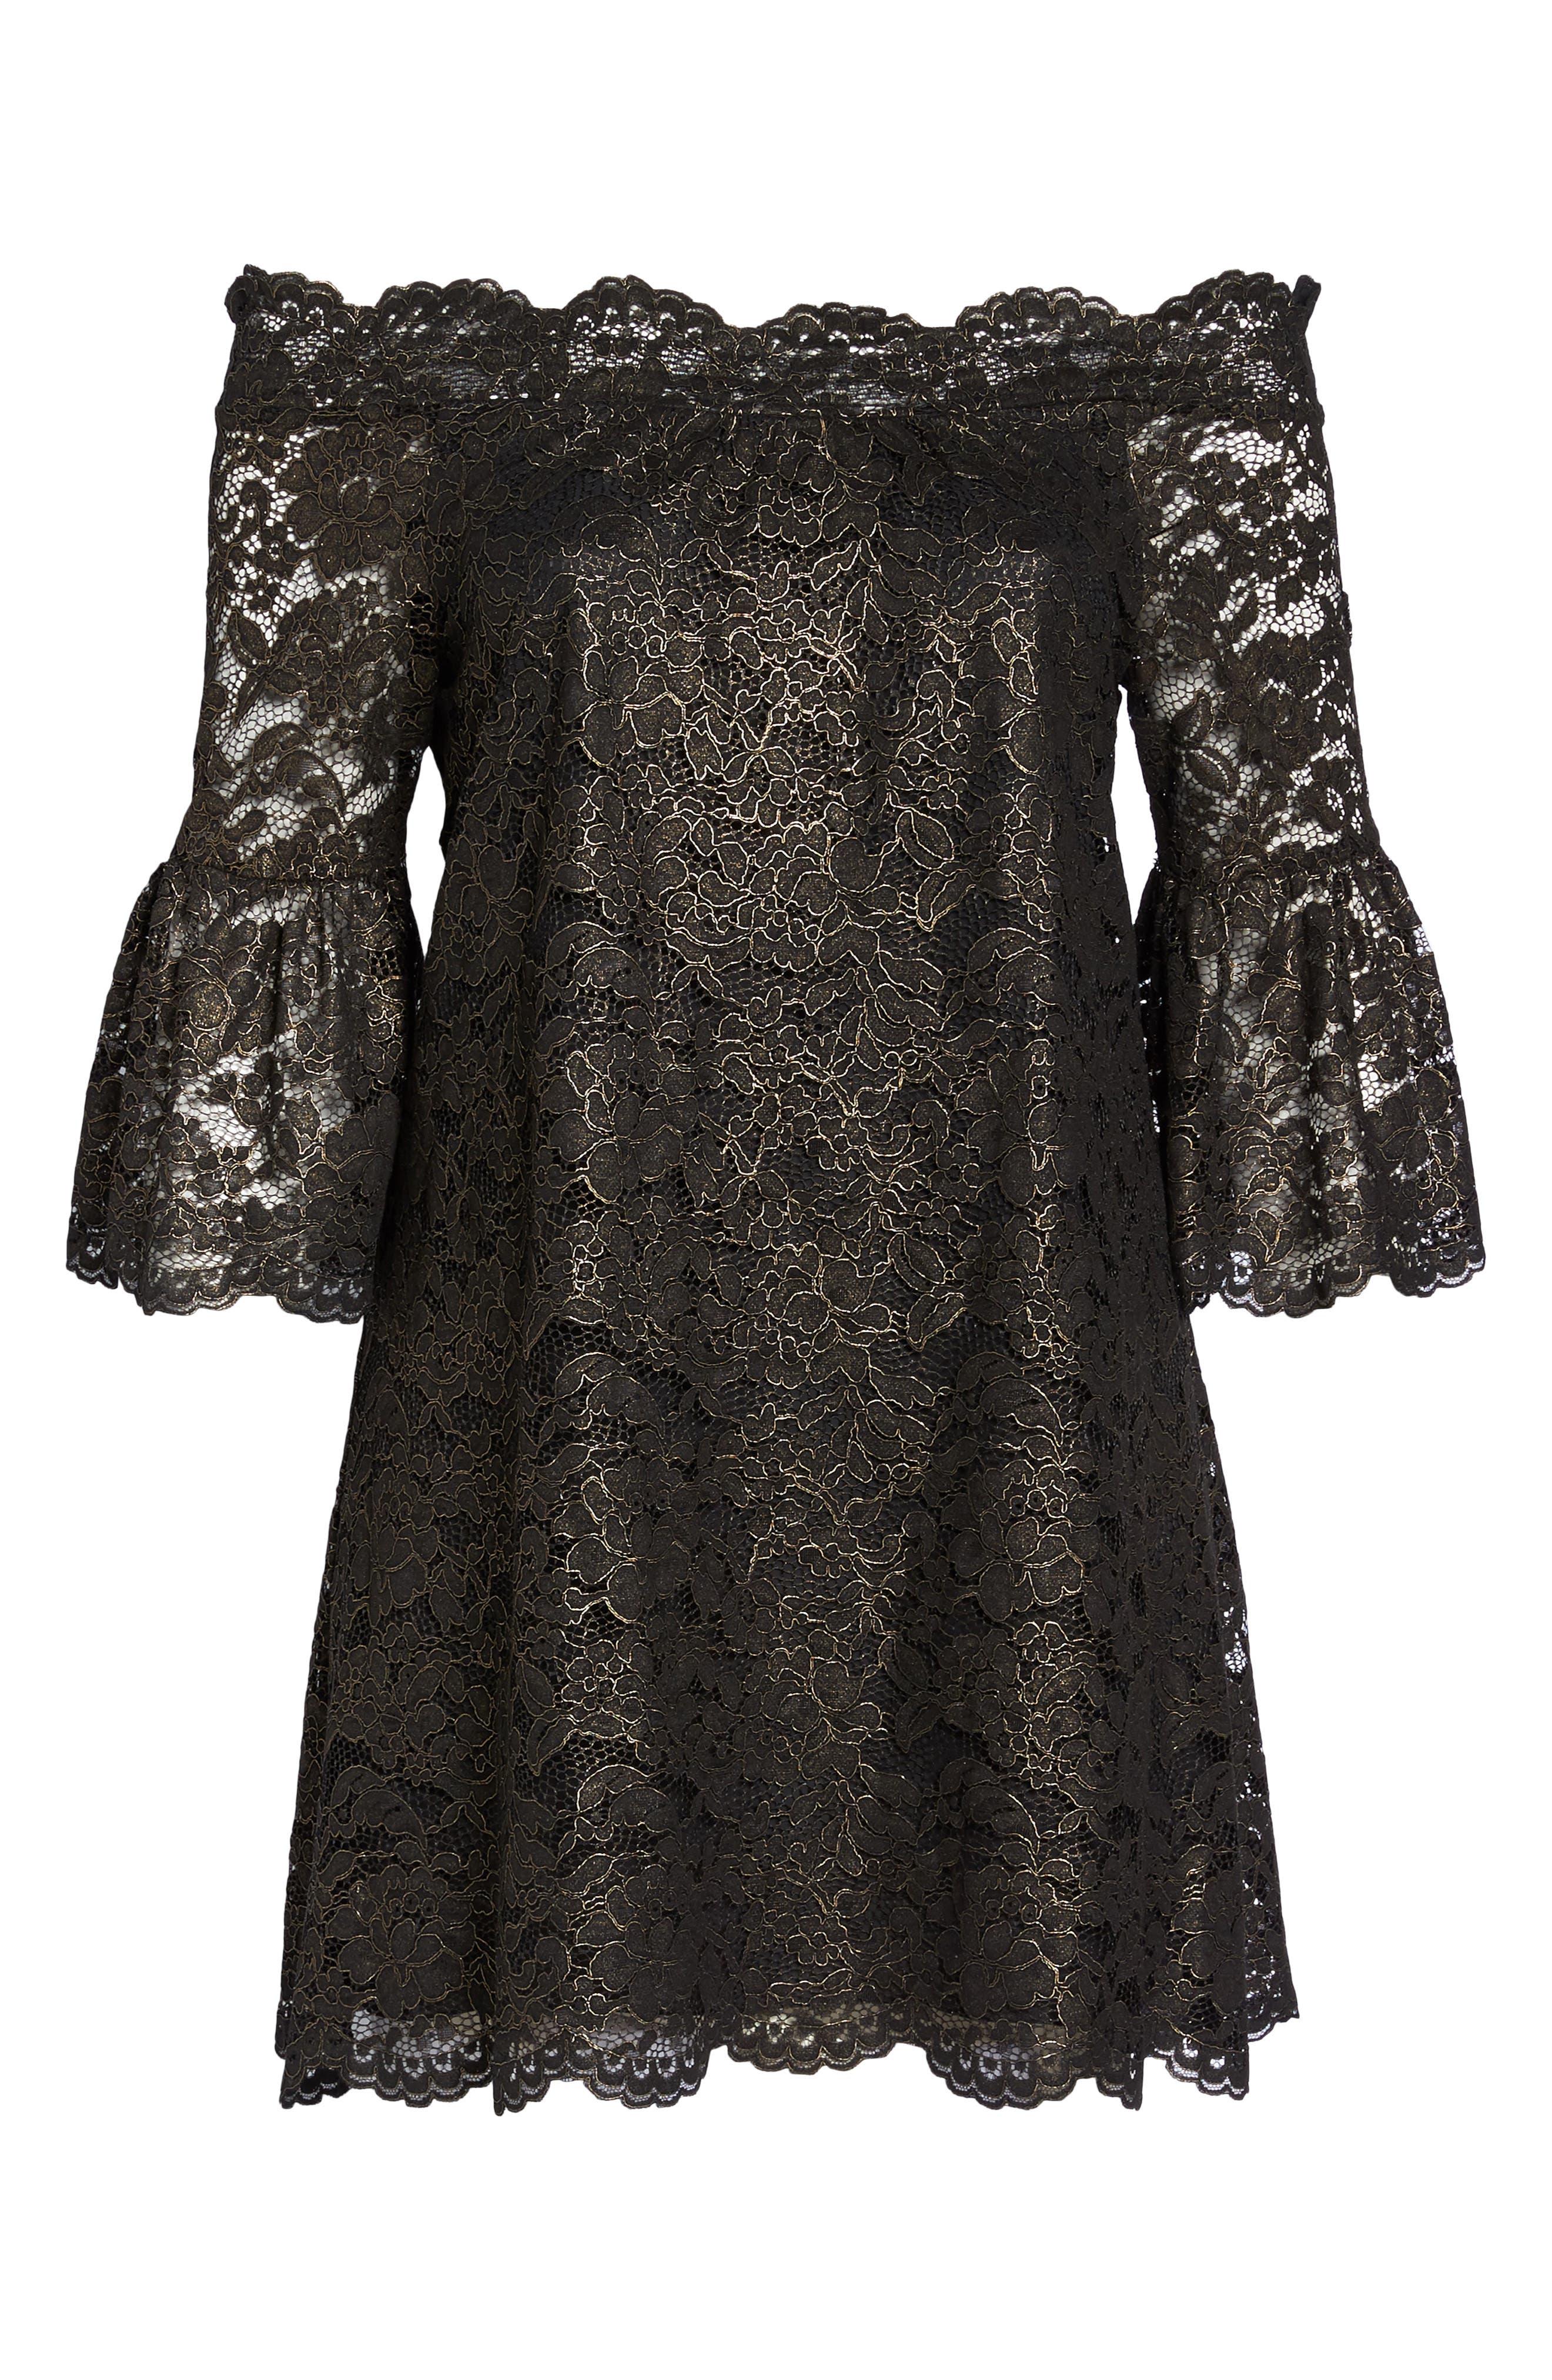 Off the Shoulder Black Gold Lace Dress,                             Alternate thumbnail 6, color,                             005